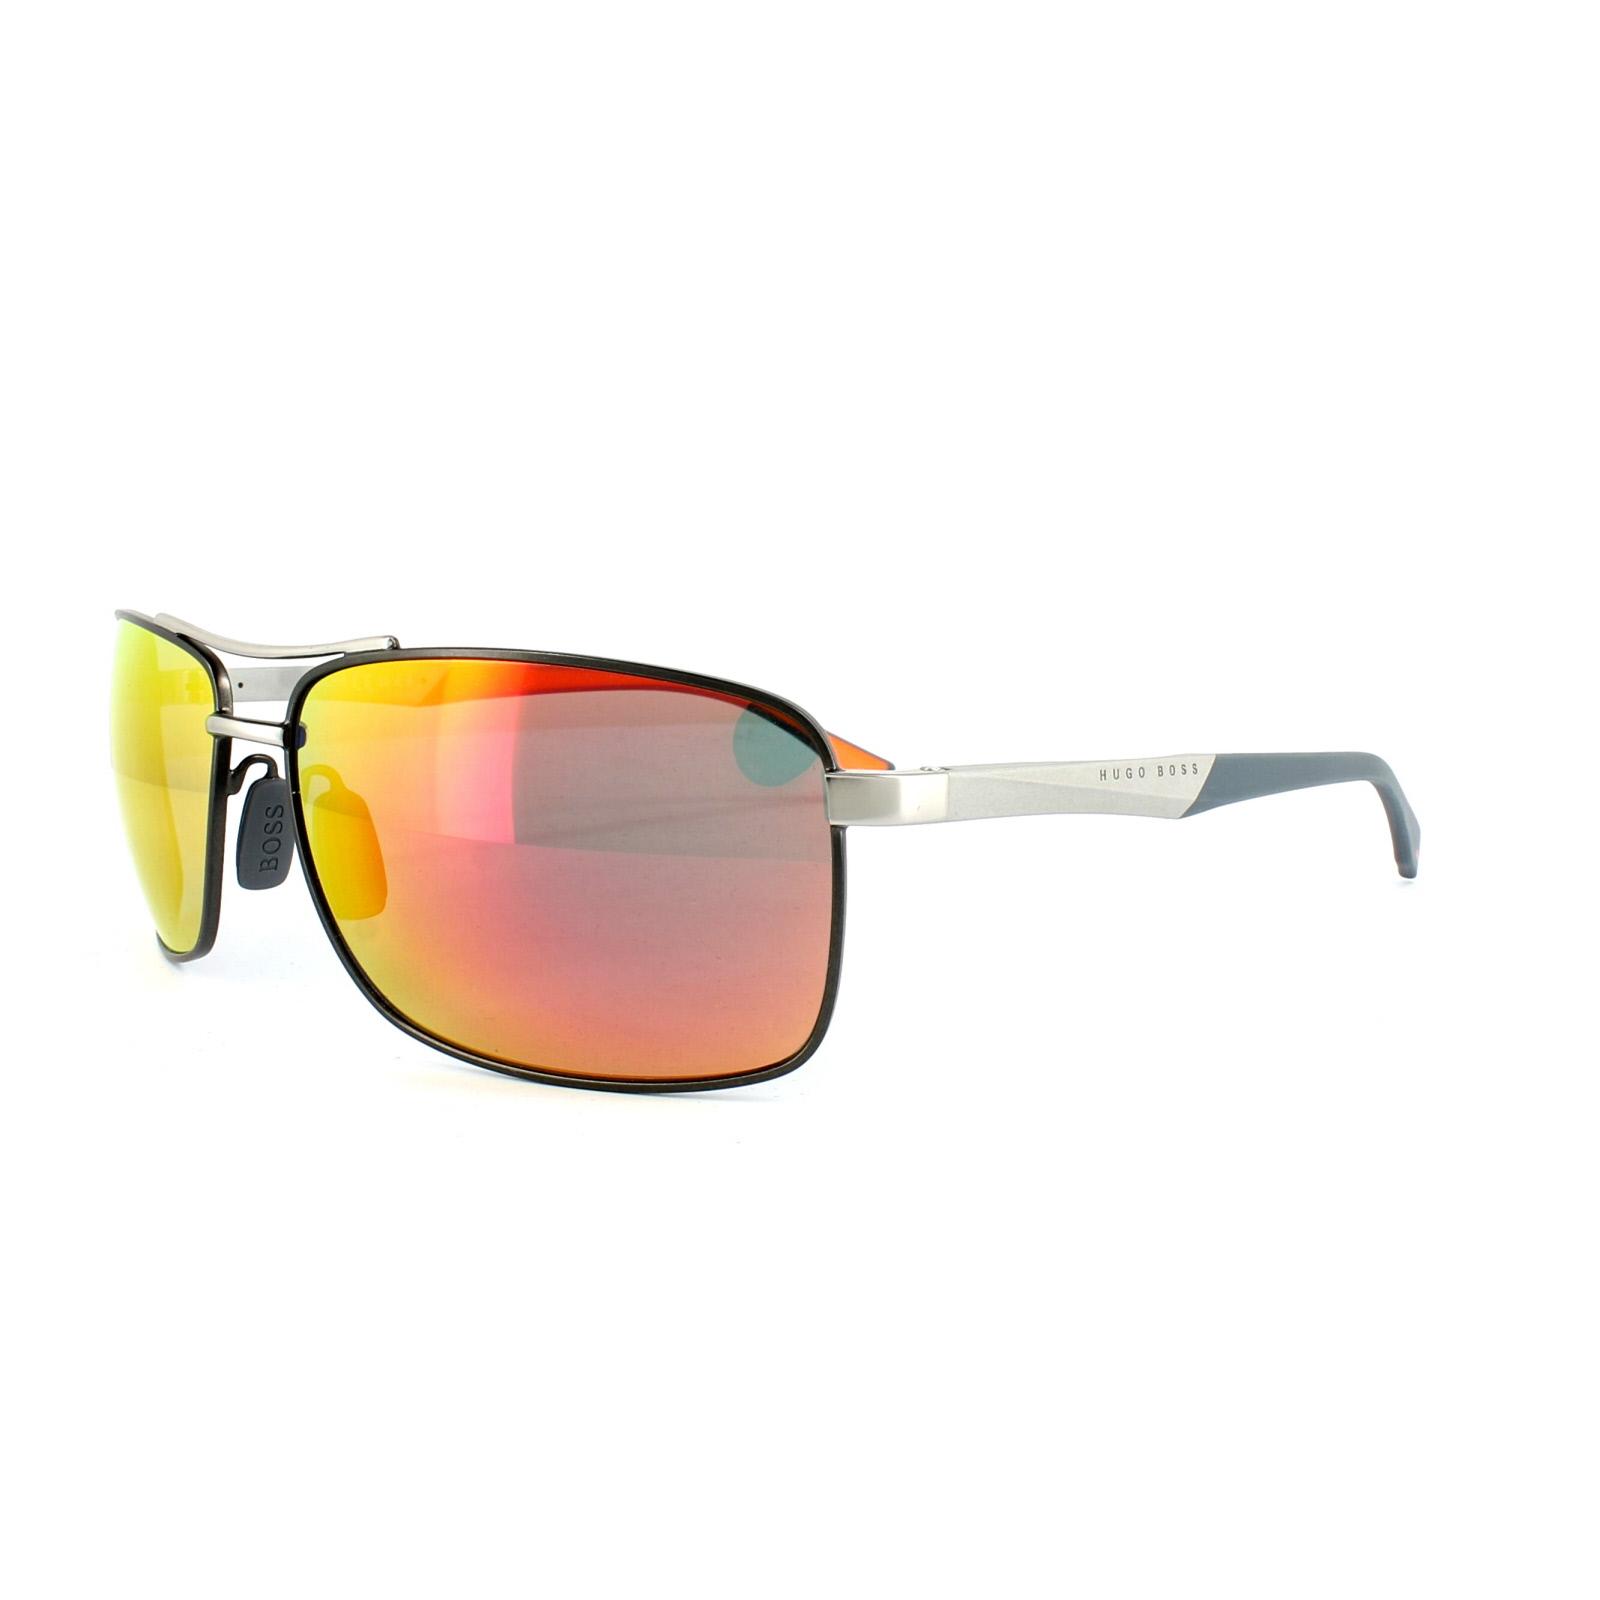 d5f5fb514d Sentinel Hugo Boss Sunglasses 0697 P S IIG 7H Ruthenium Orange Red Mirror  Polarized